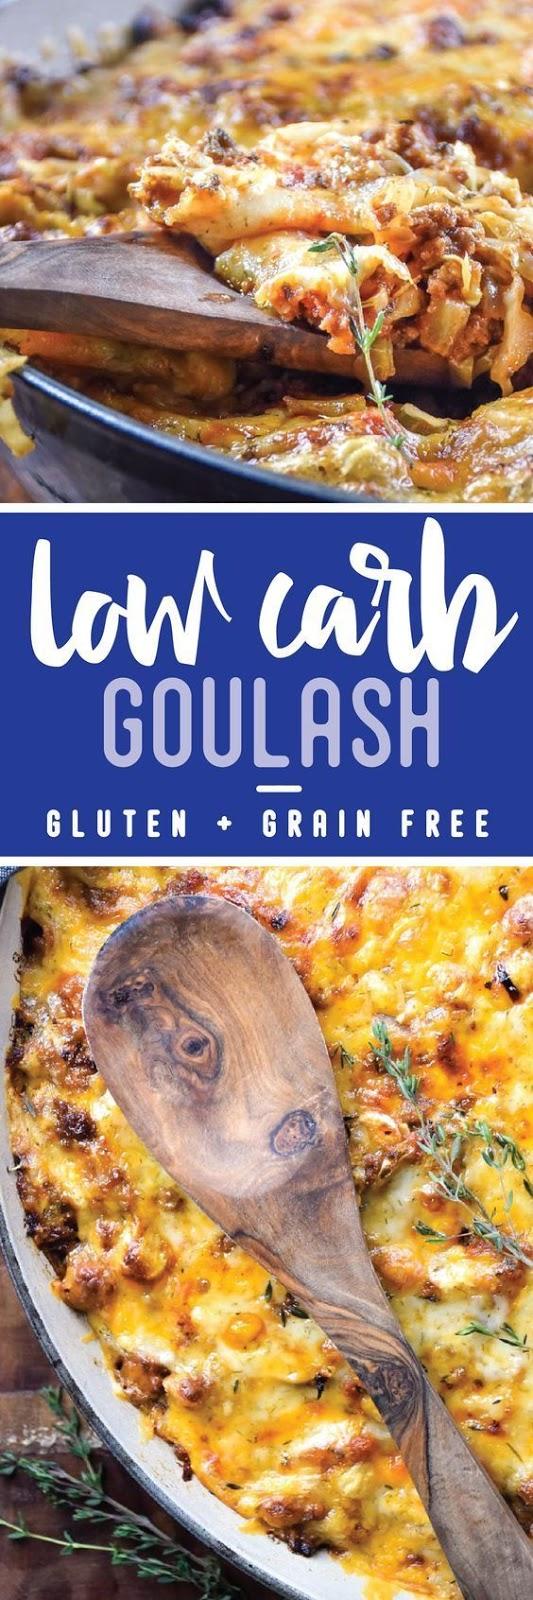 LOW CARB GOULASH